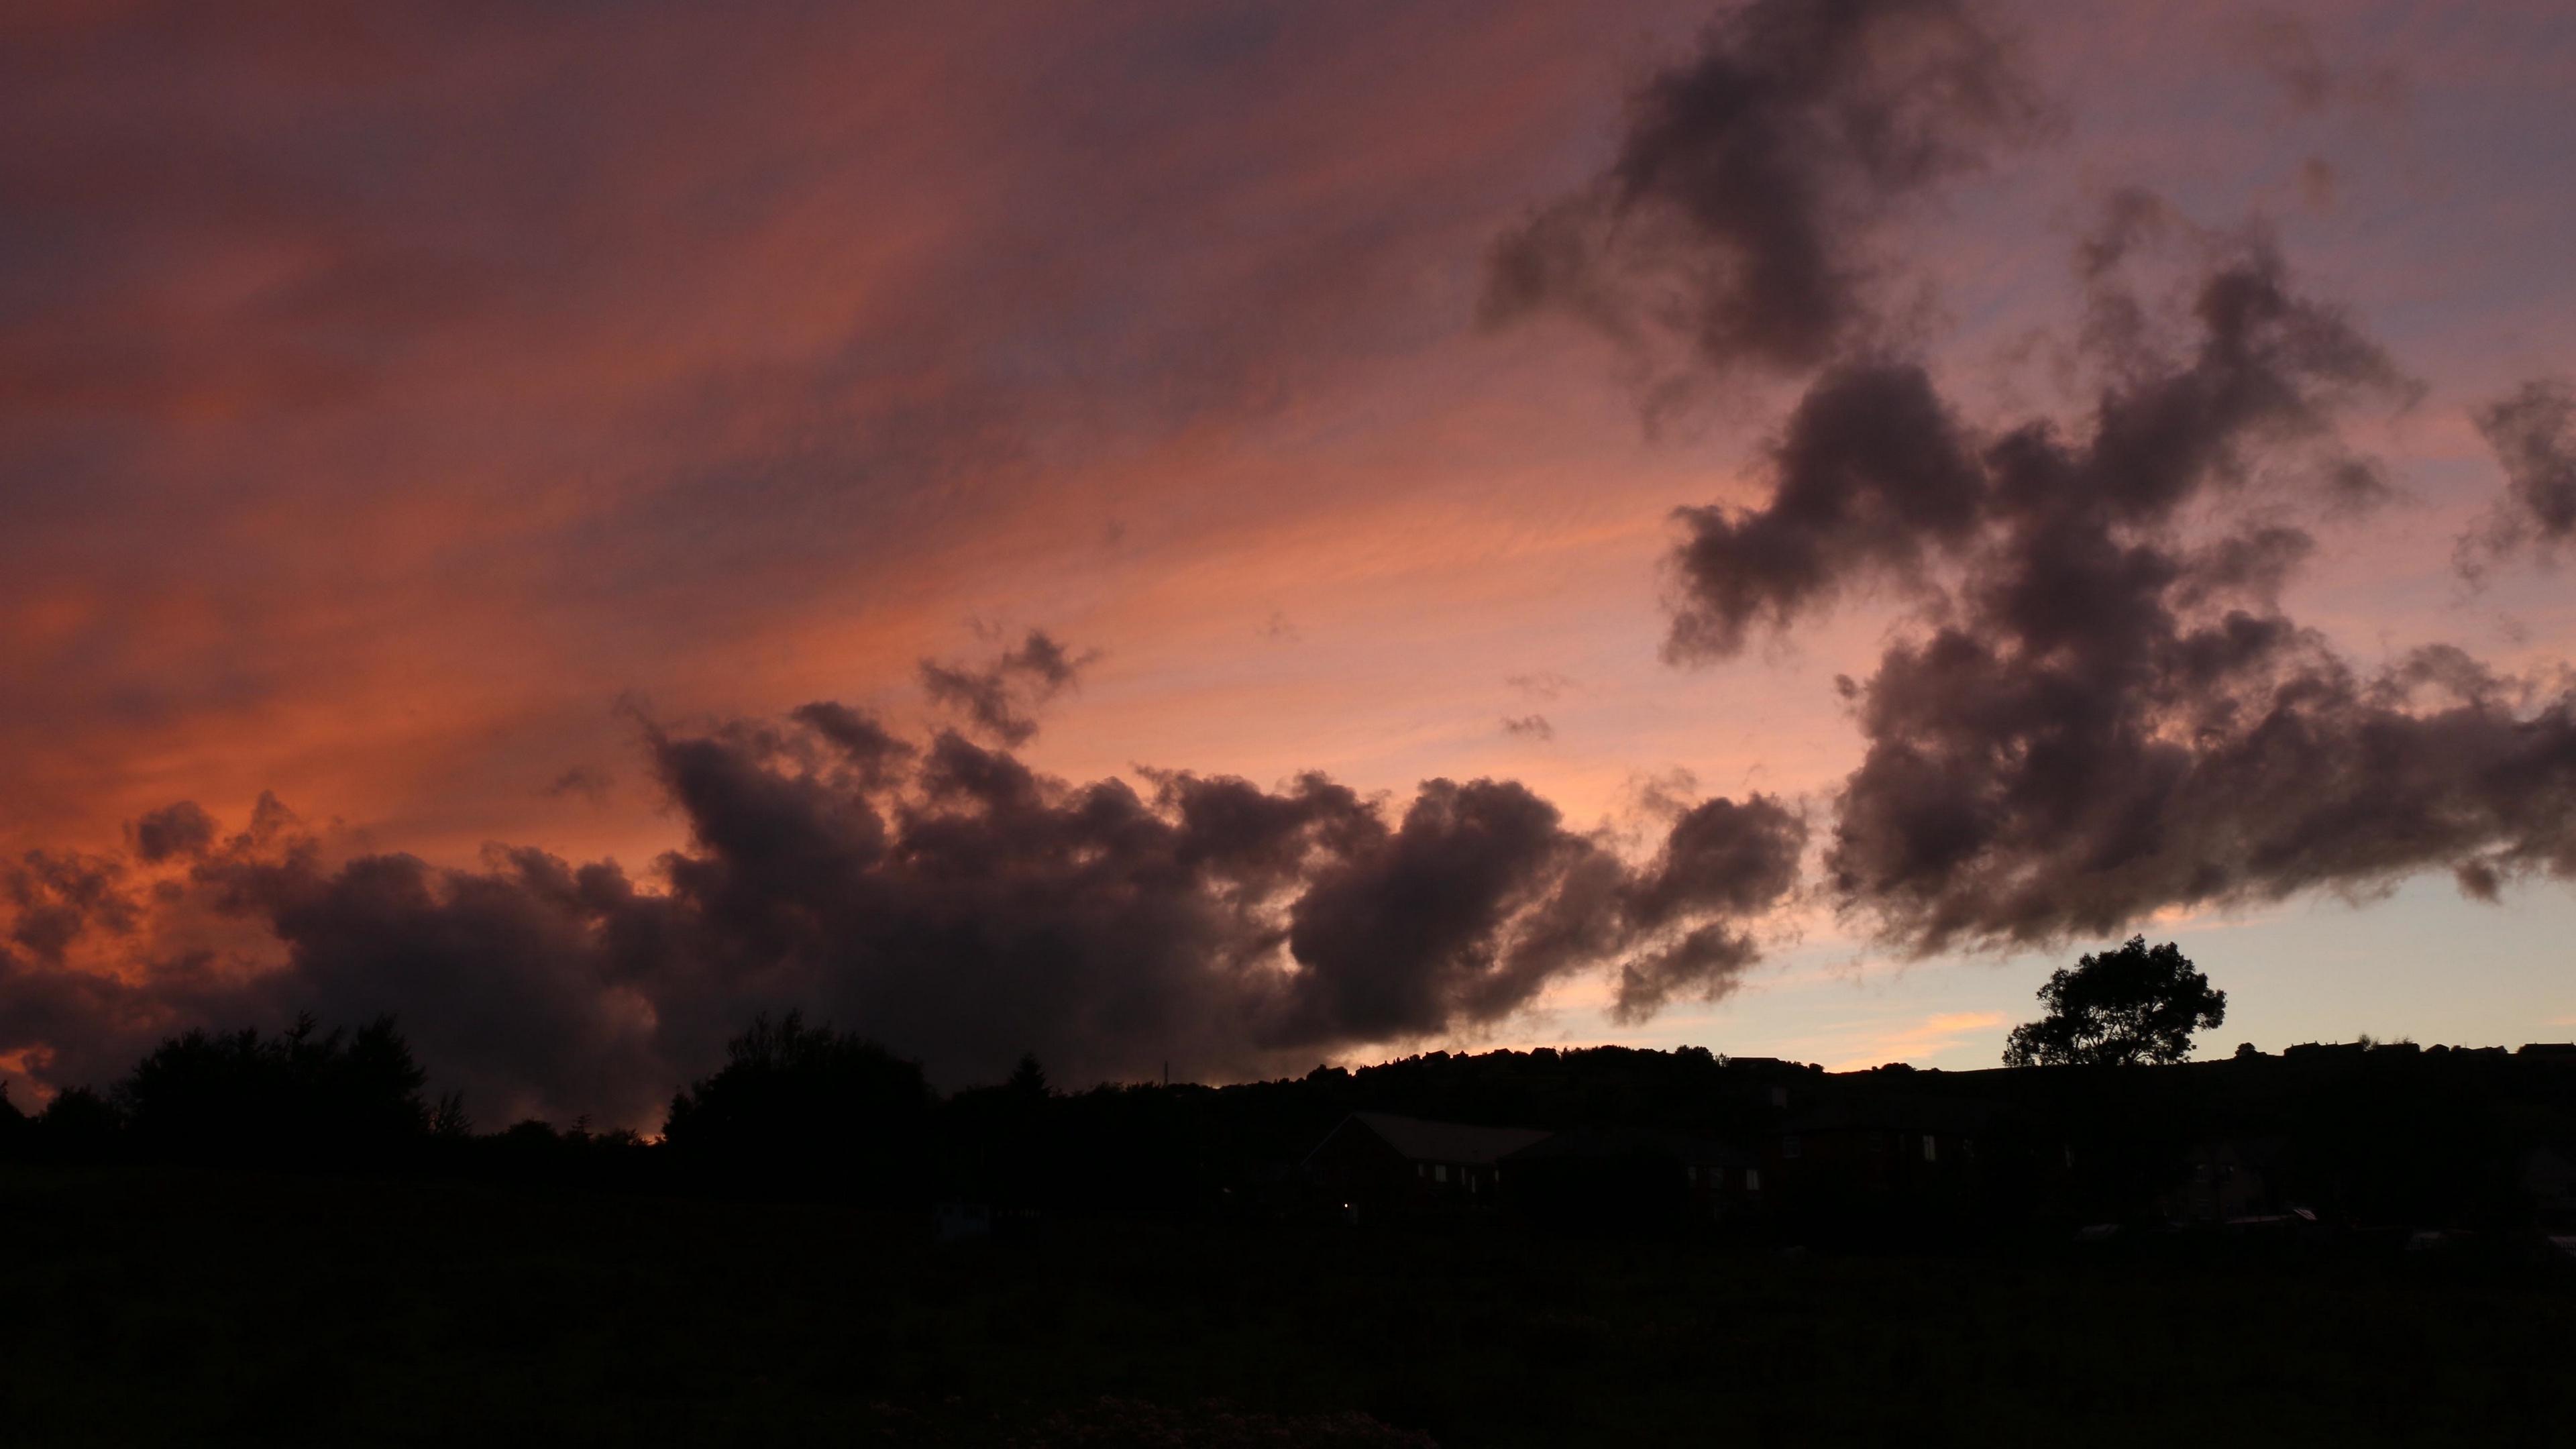 twilight sunset clouds 4k 1540575991 - twilight, sunset, clouds 4k - Twilight, sunset, Clouds